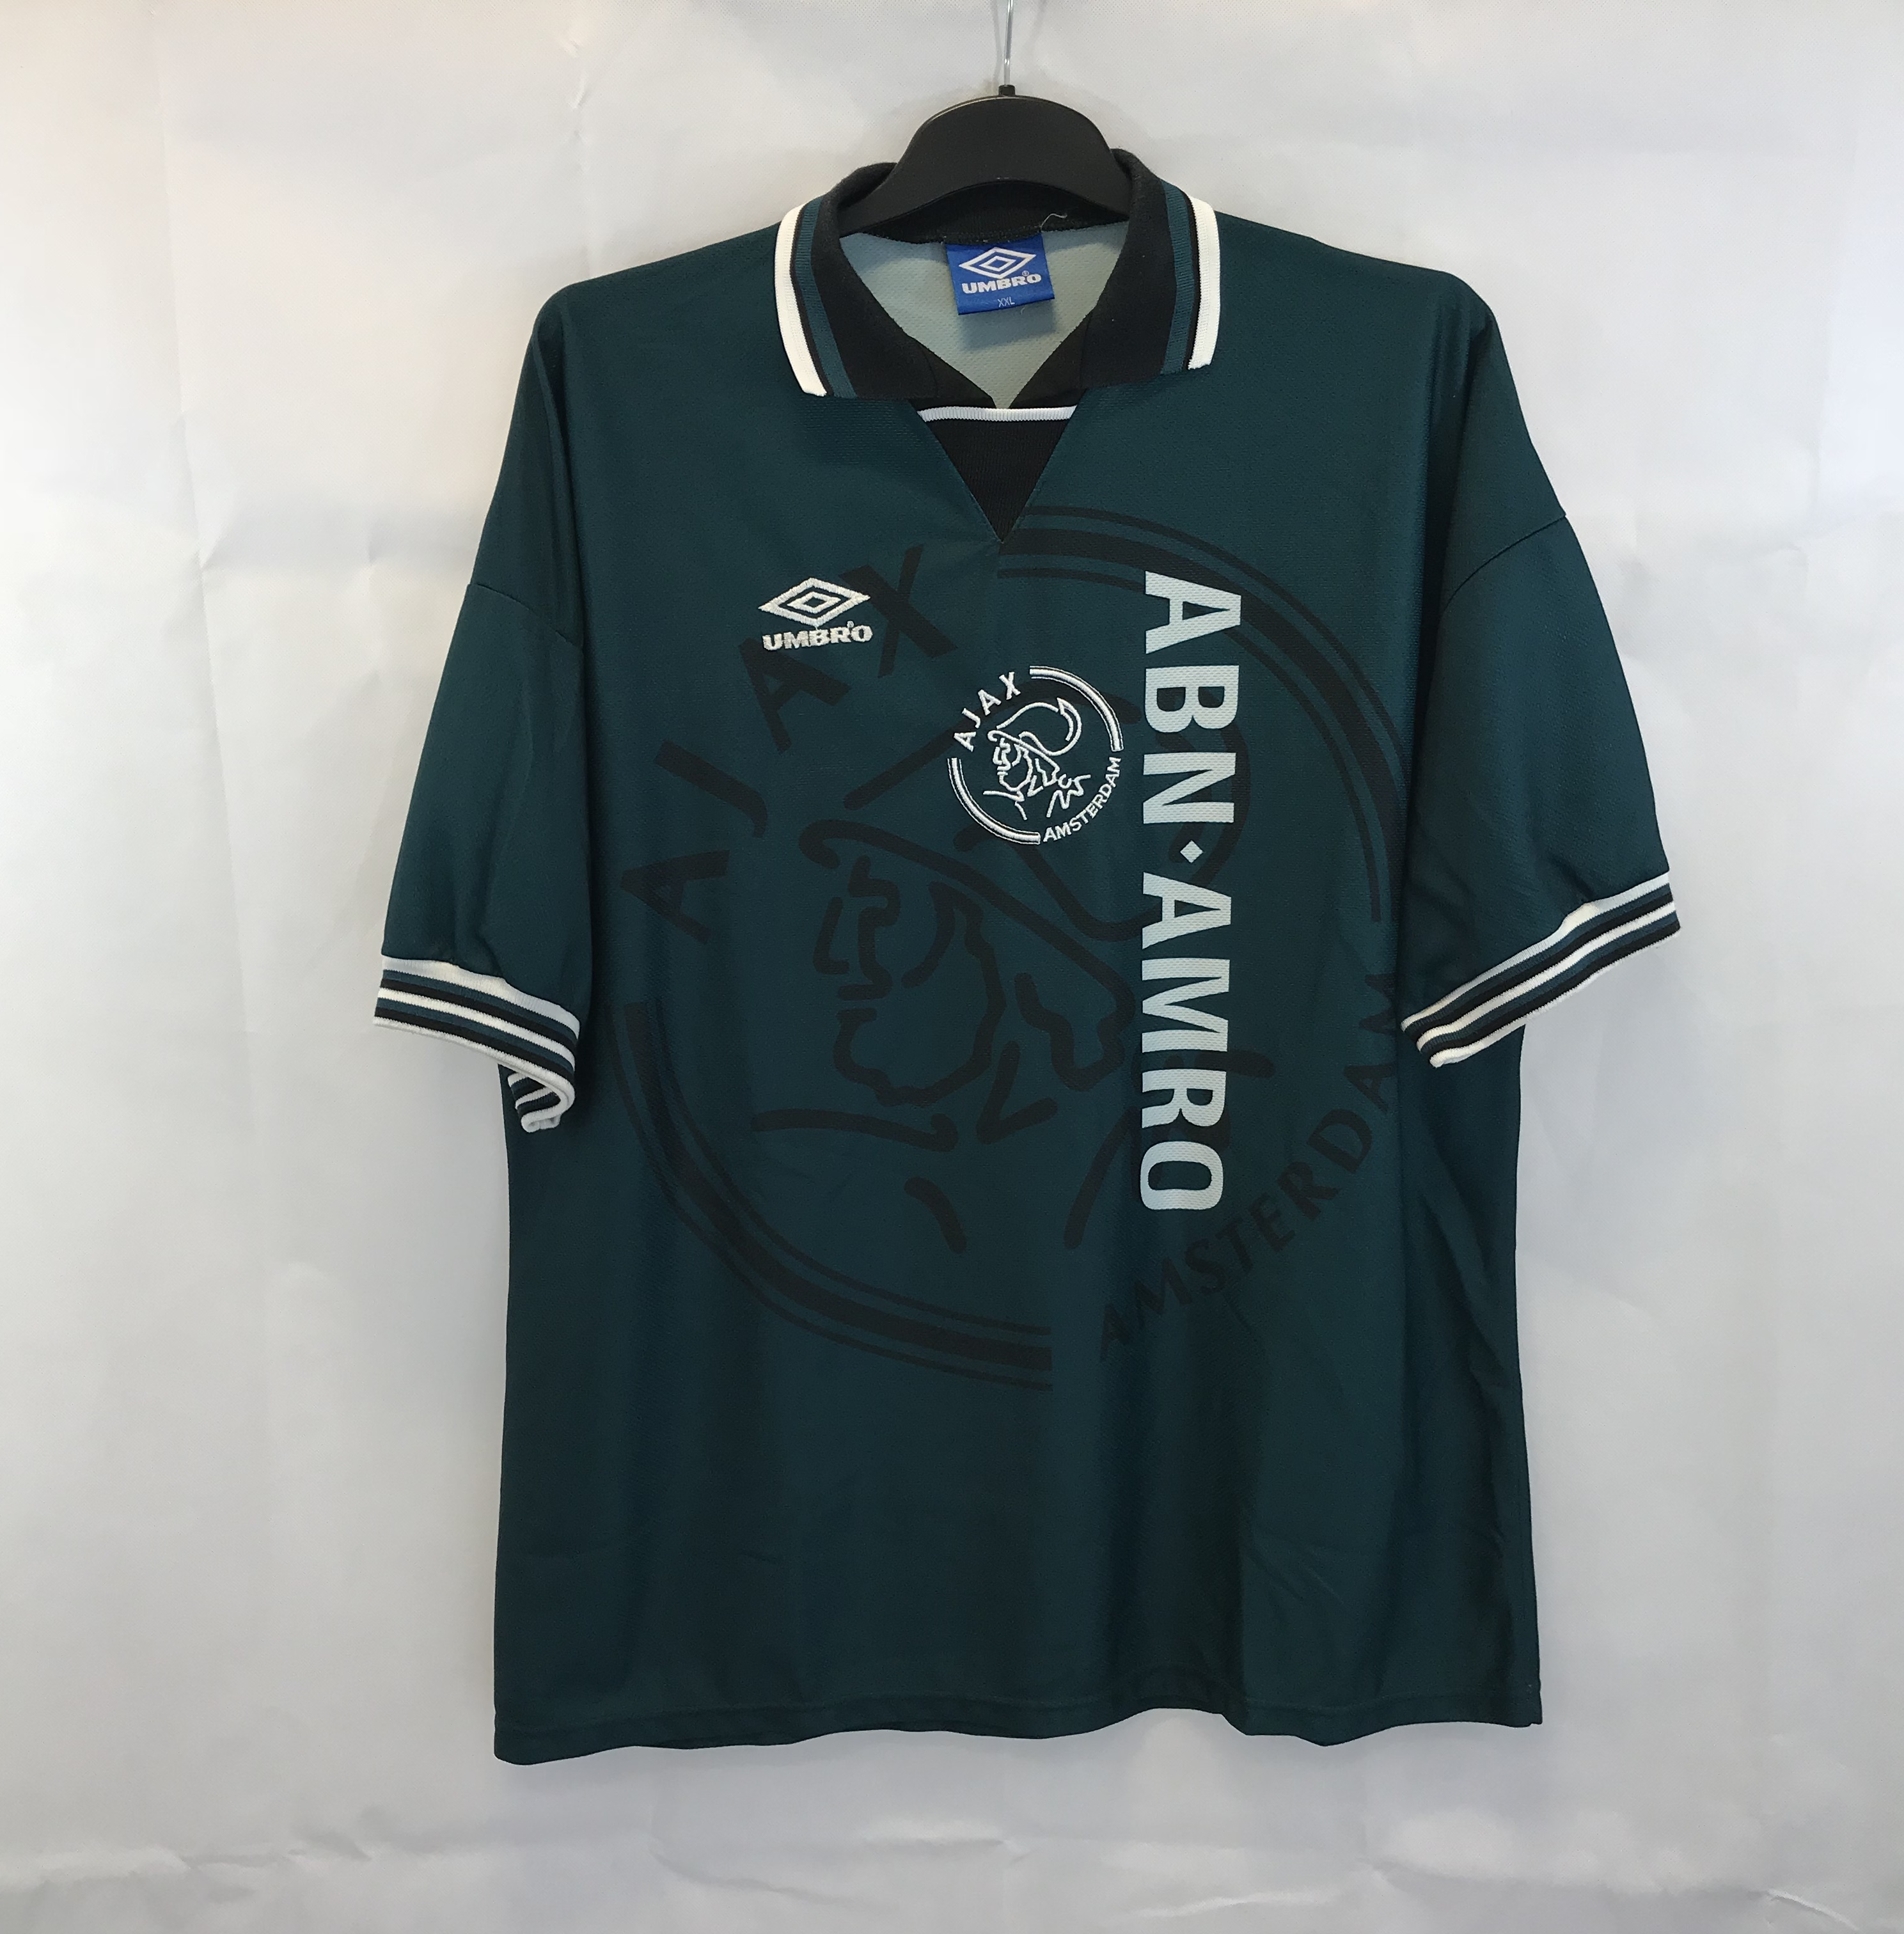 57c5a7e01 Ajax Away Football Shirt 1995/96 Adults XXL Umbro – Historic ...